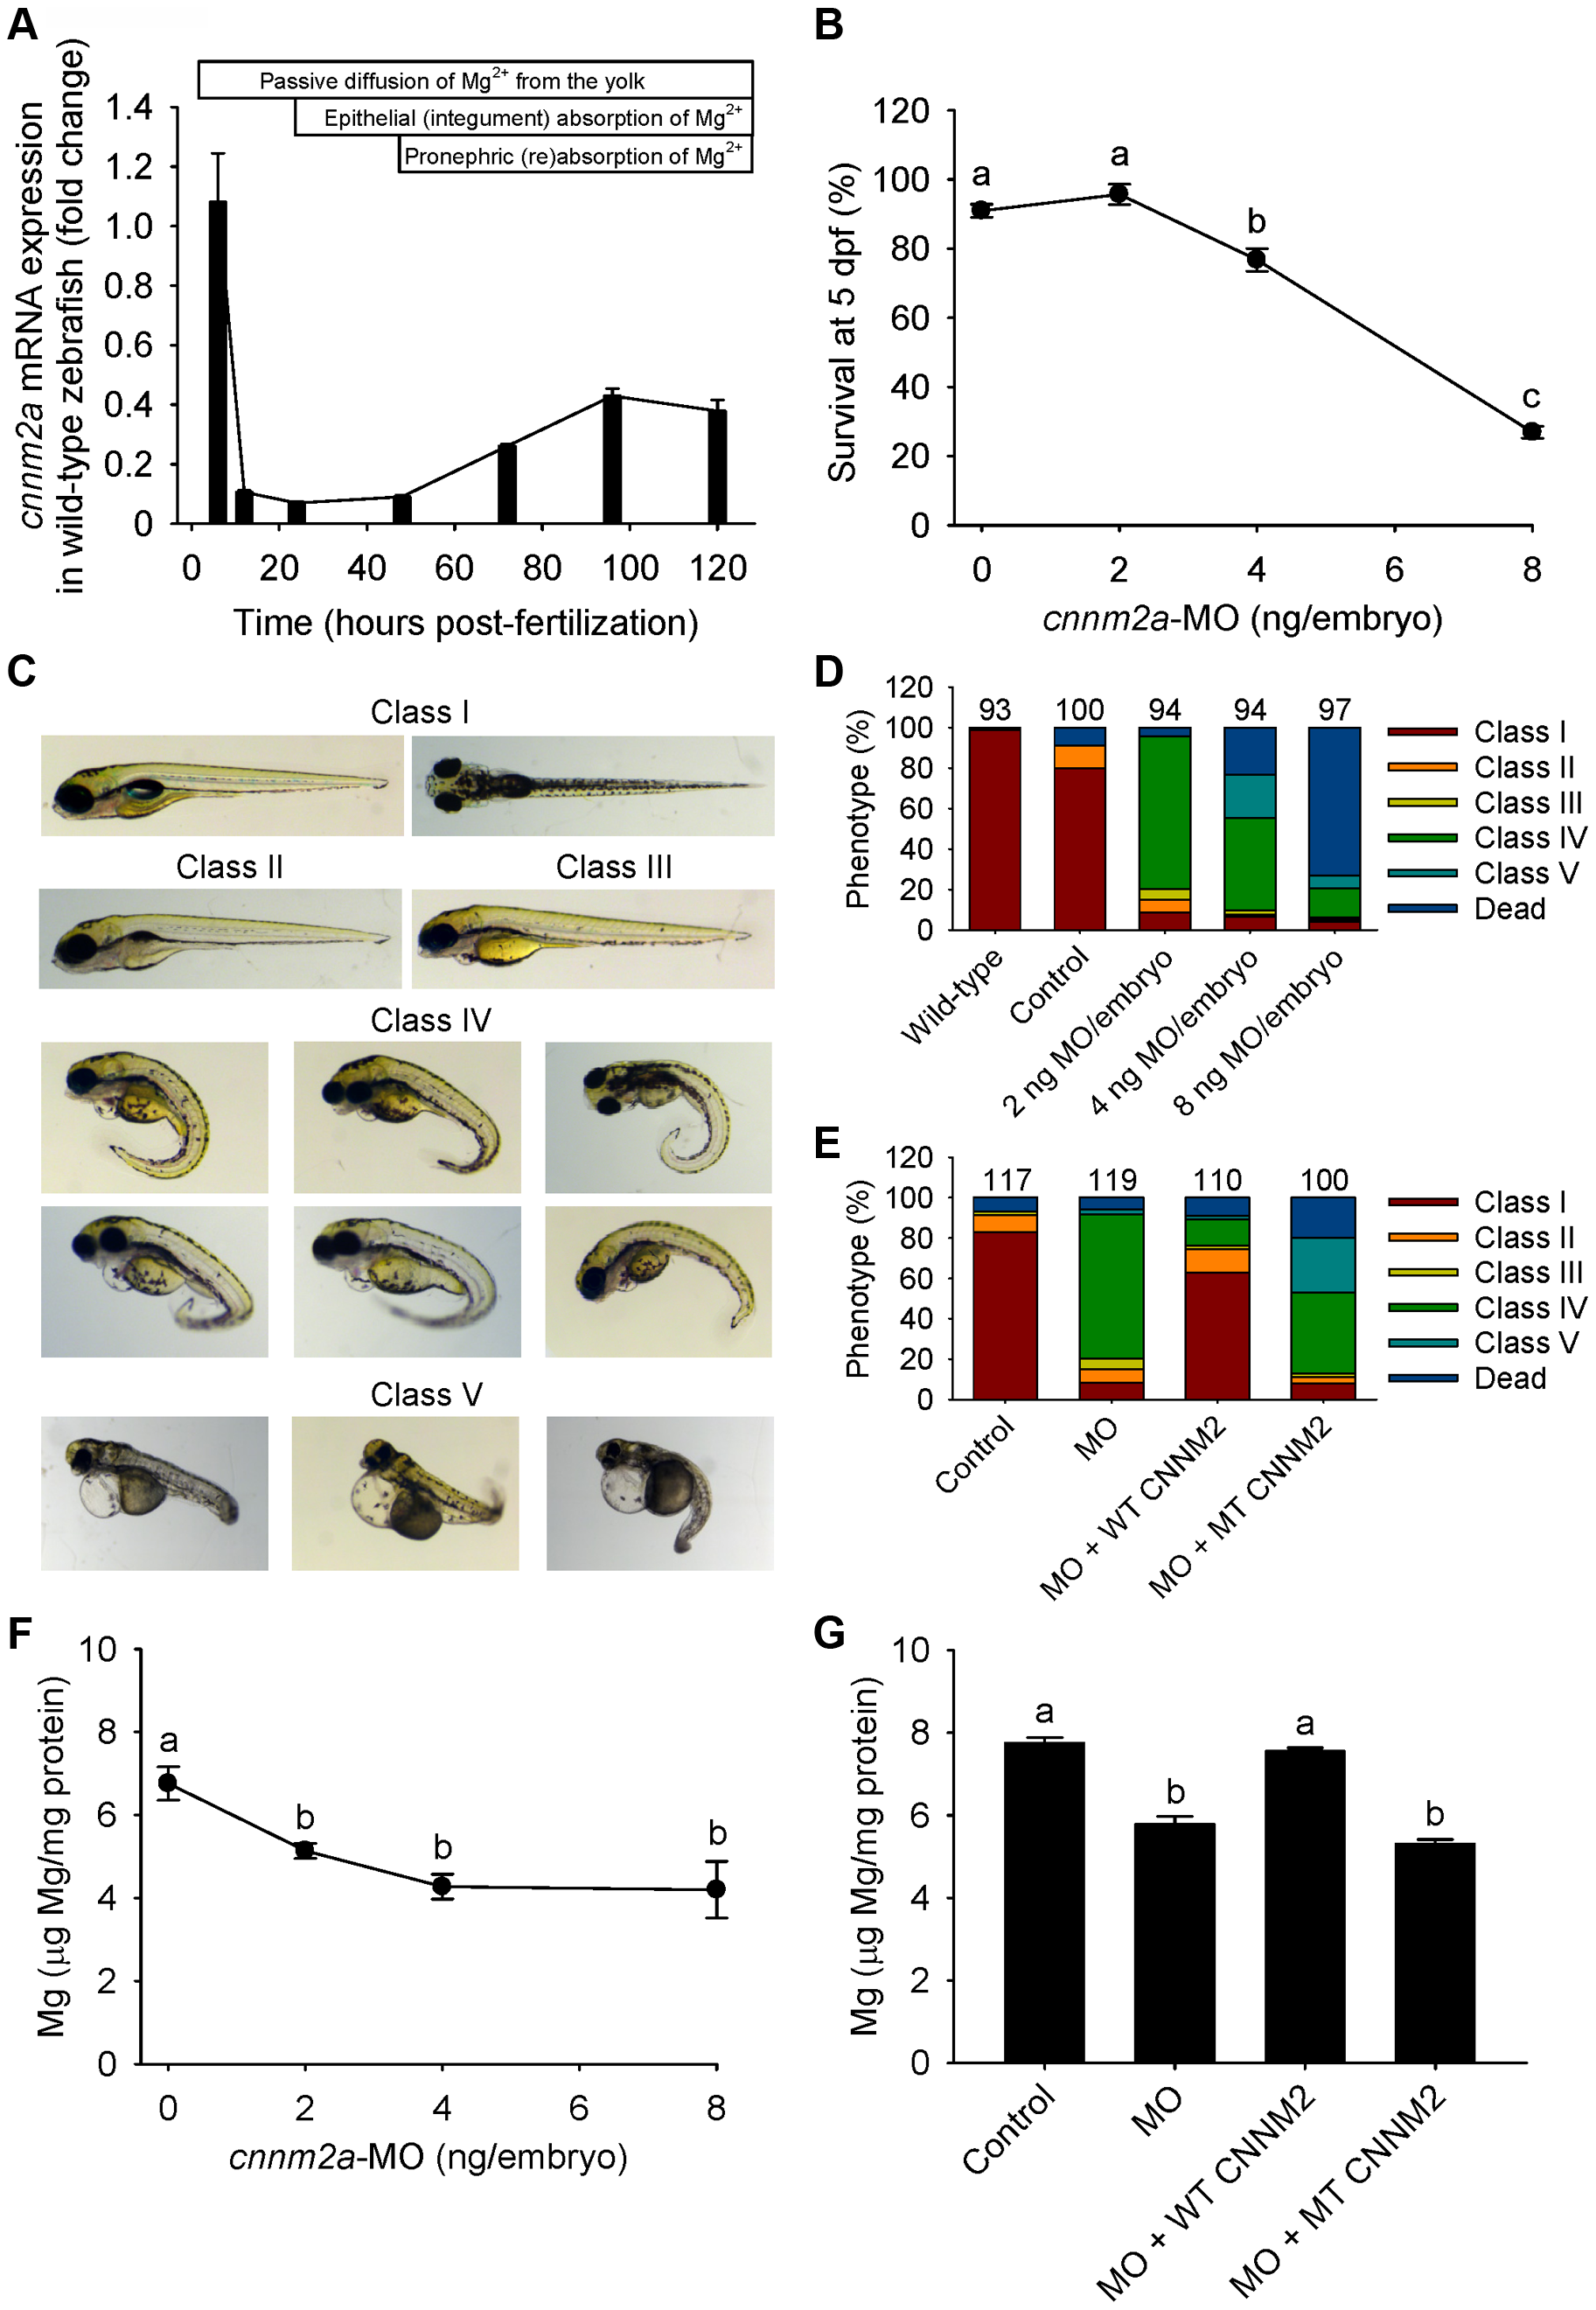 Knockdown of <i>cnnm2a</i> results in Mg wasting in zebrafish larvae (5 dpf).